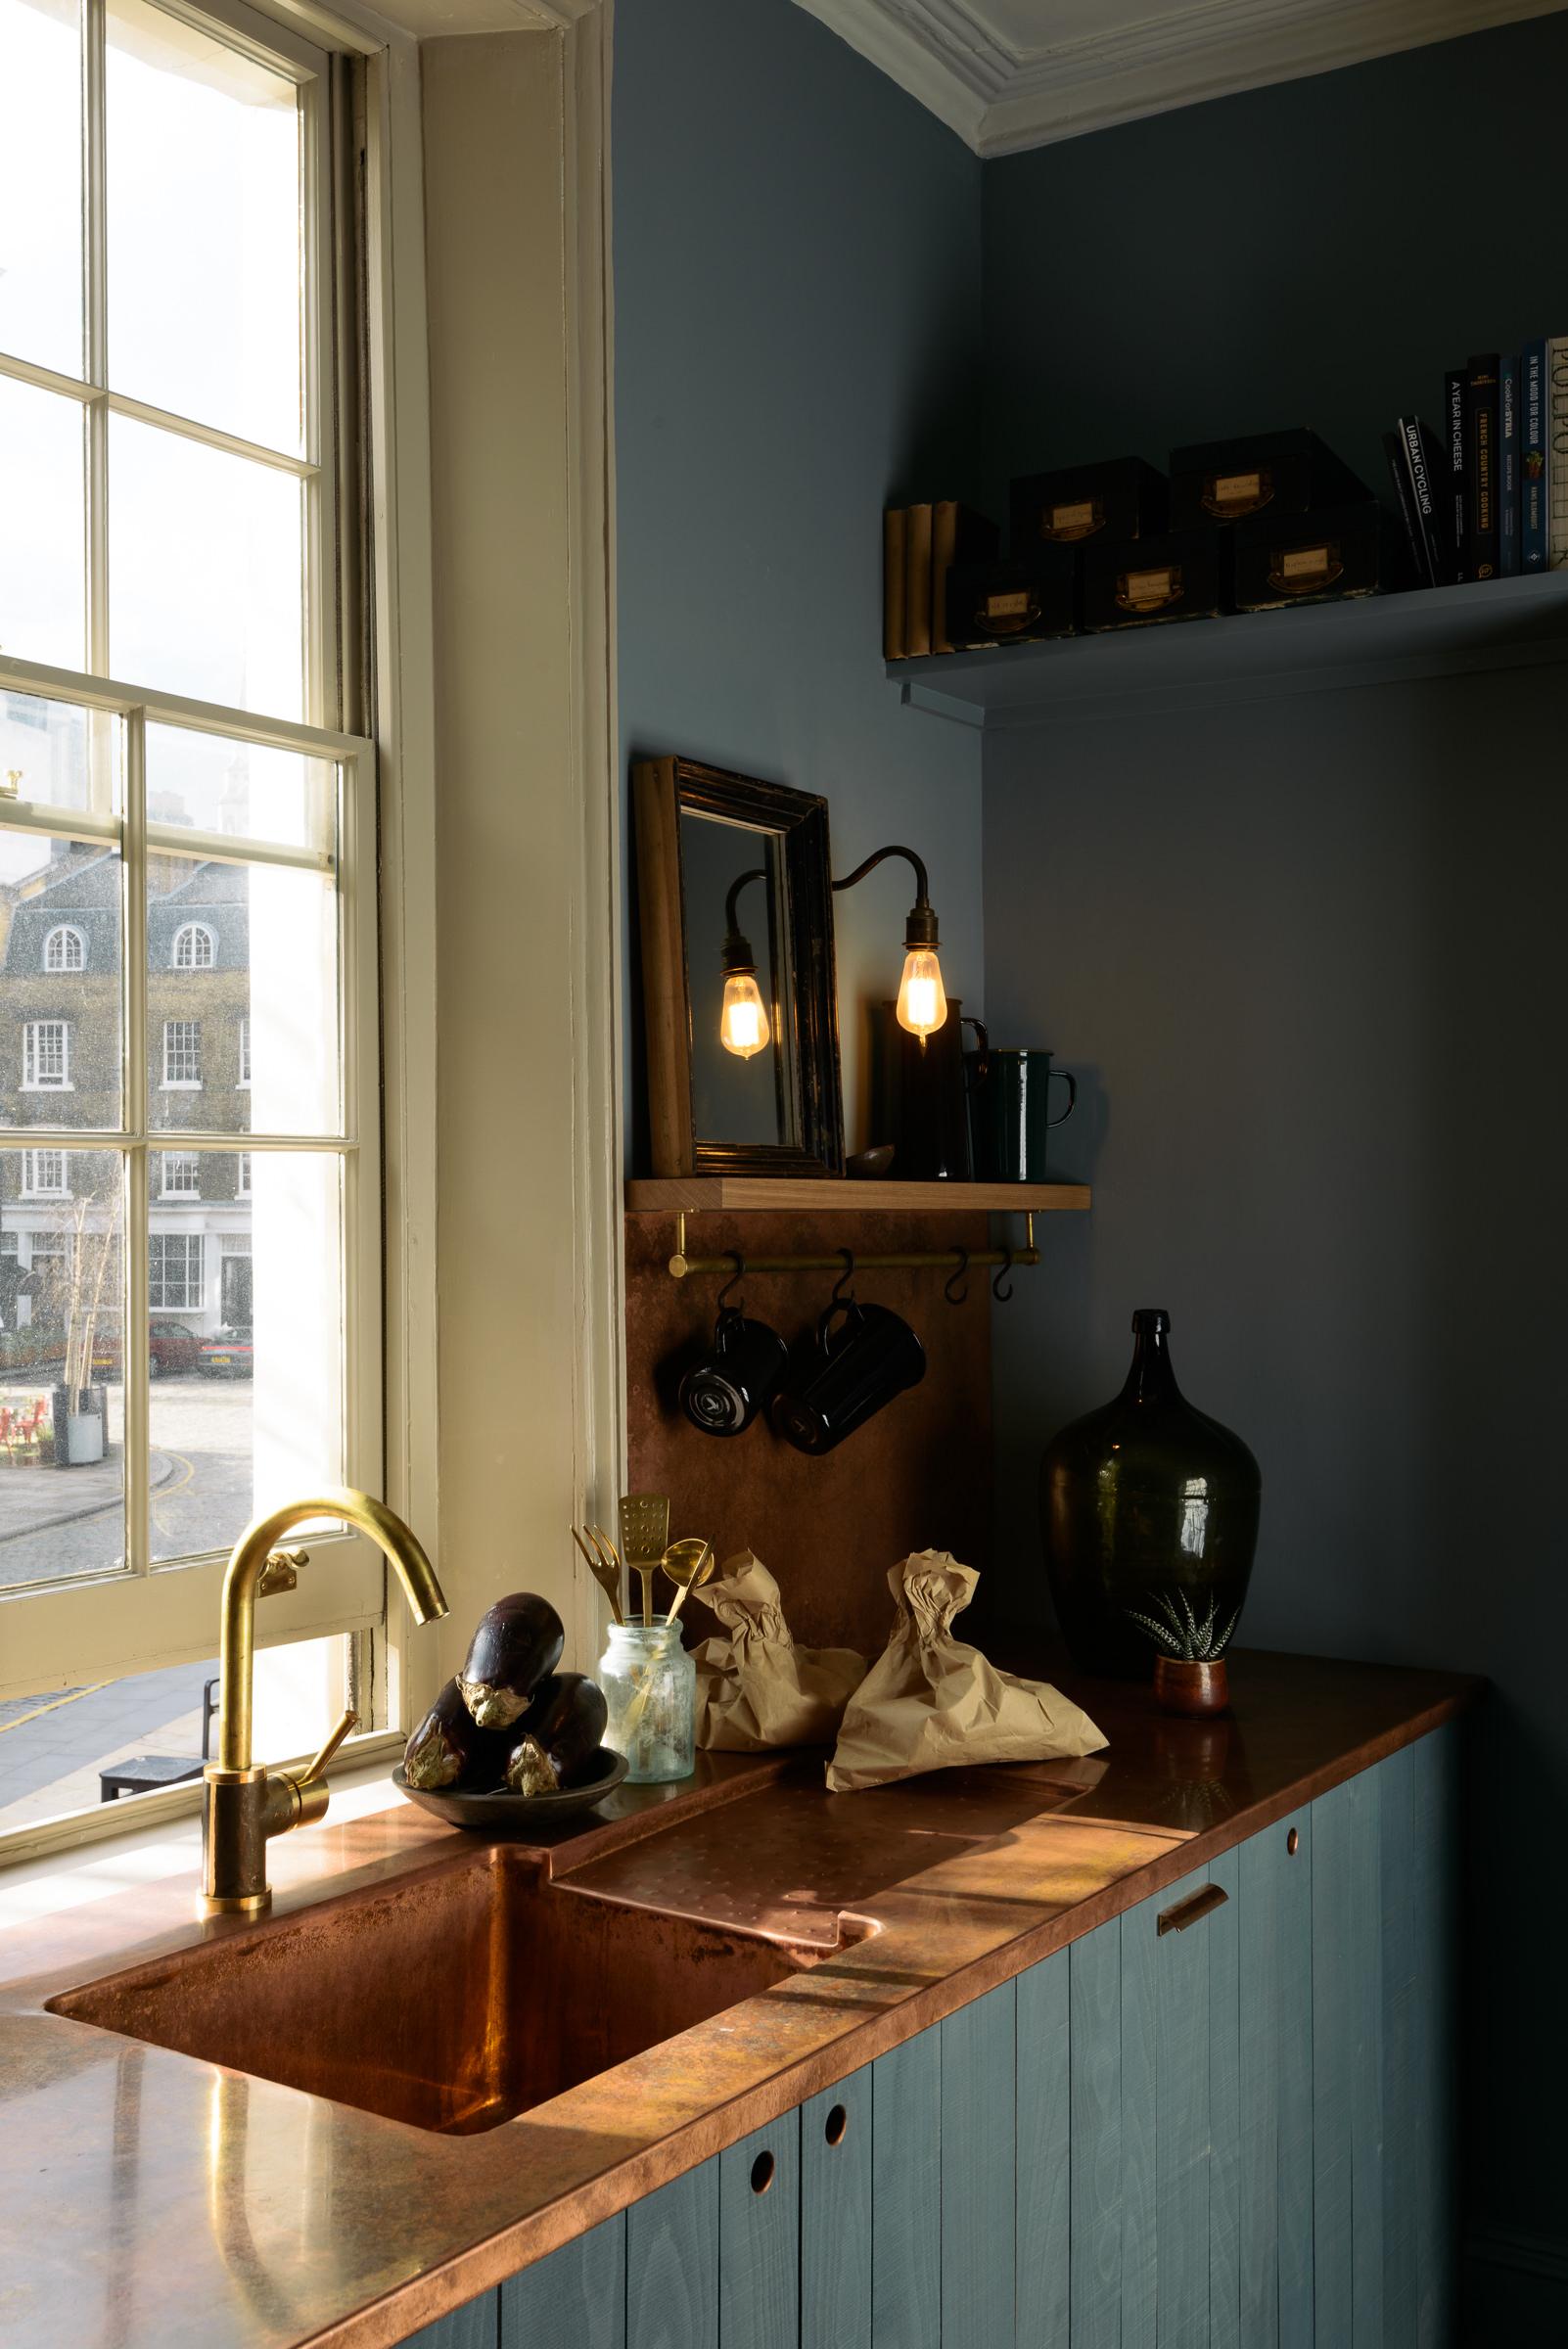 The St John's Townhouse Kitchen by deVOL